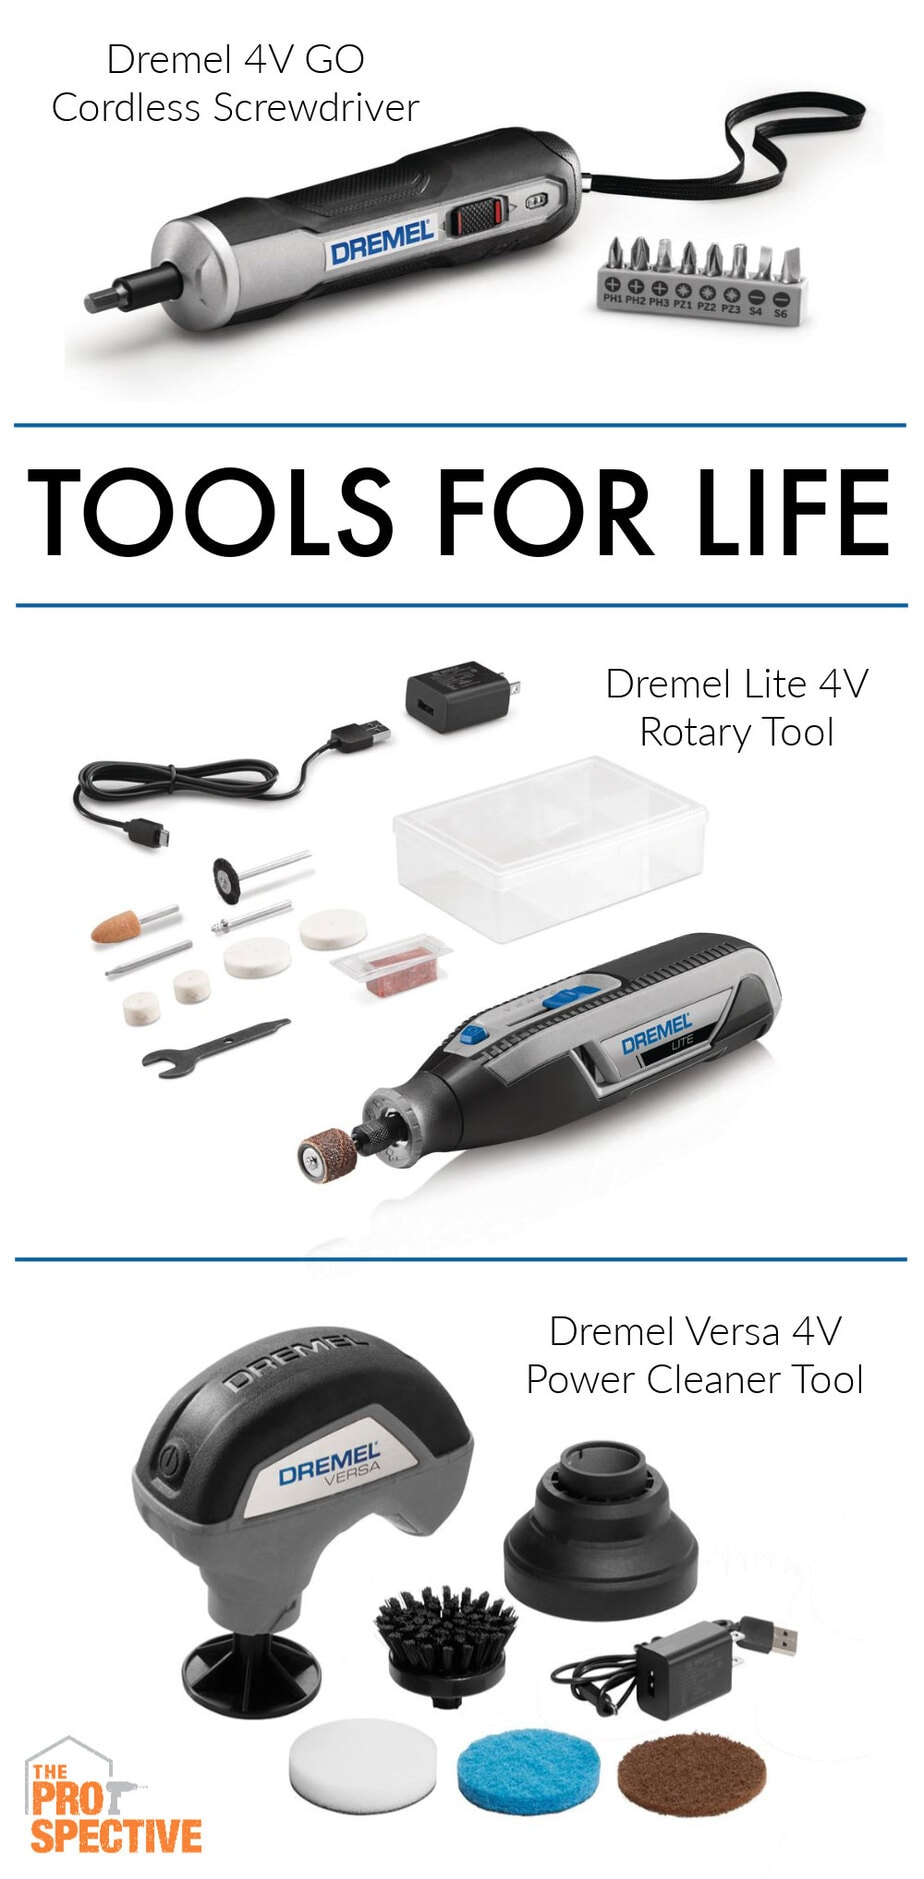 dremel tools for life